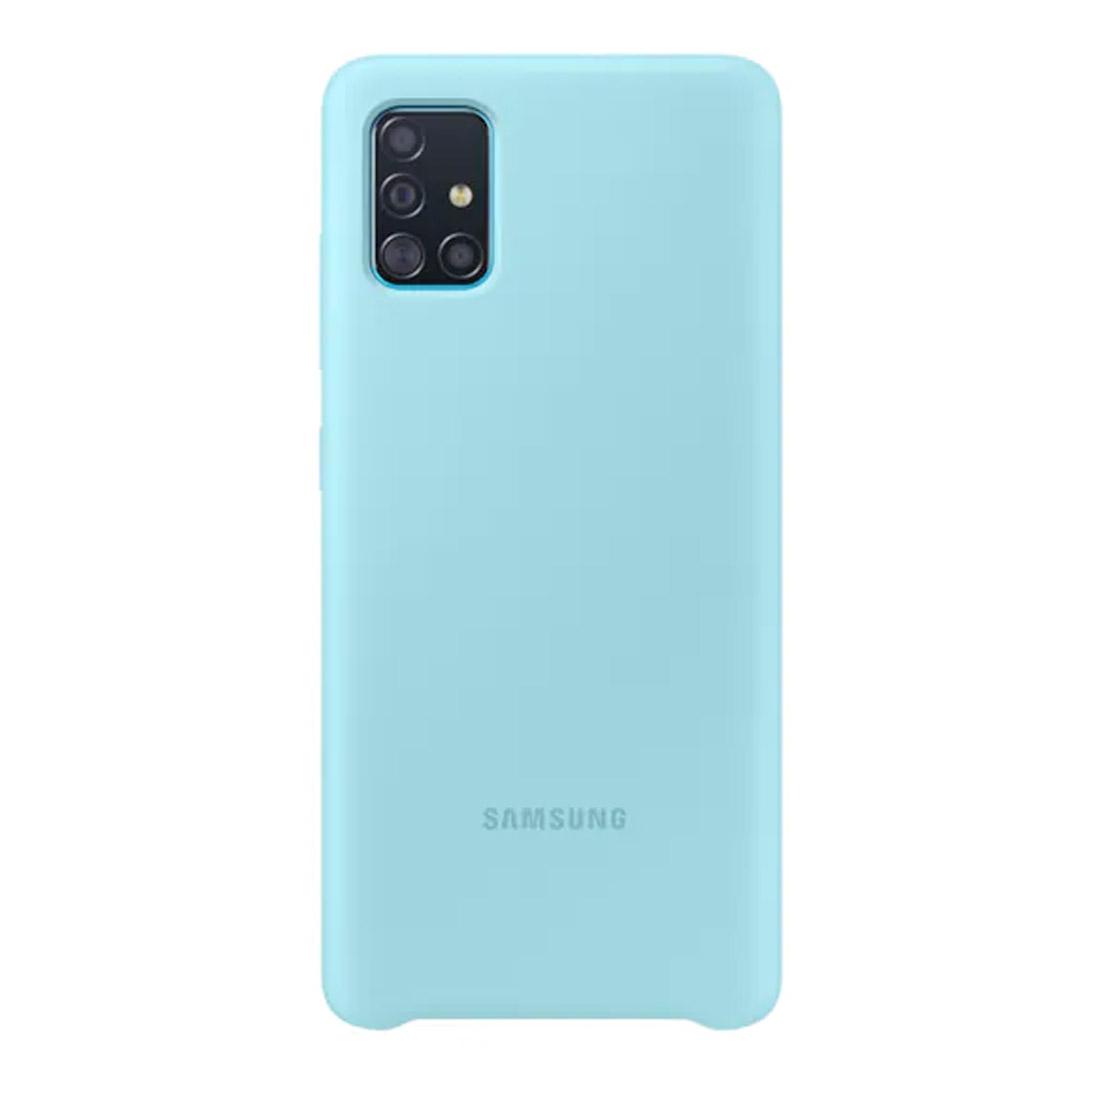 Samsung Galaxy A51 Silicone Cover - Blue